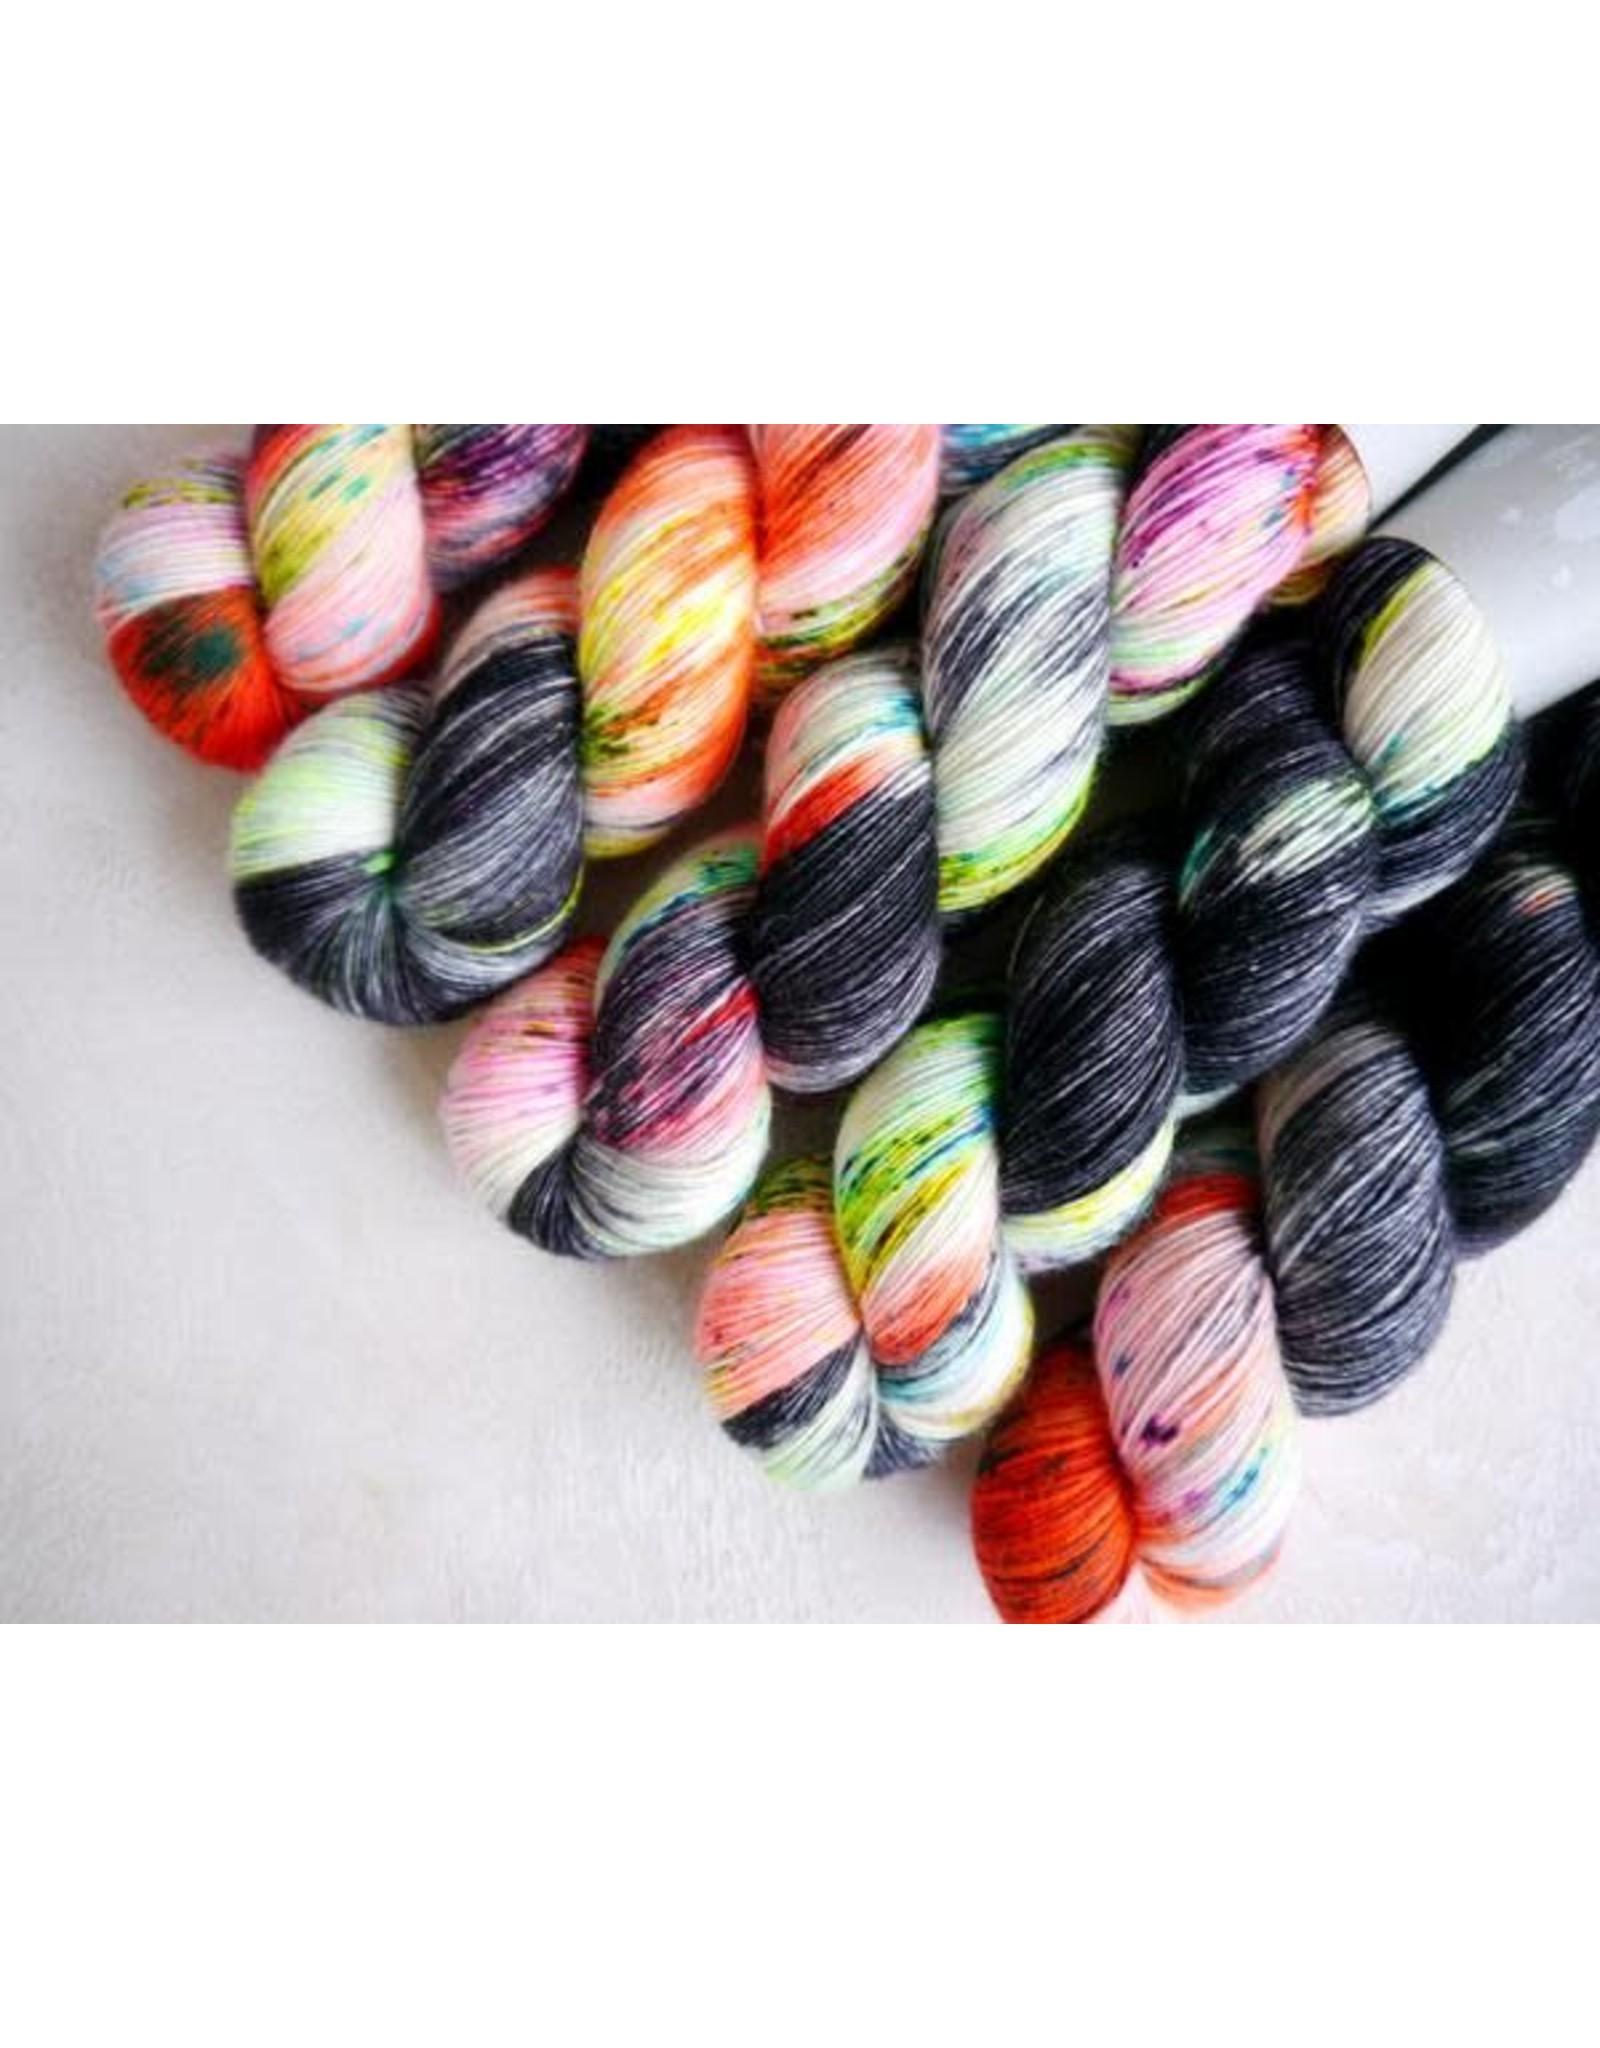 Qing Fibre Blackhare - Silky Merino Singles - Qing Fibre